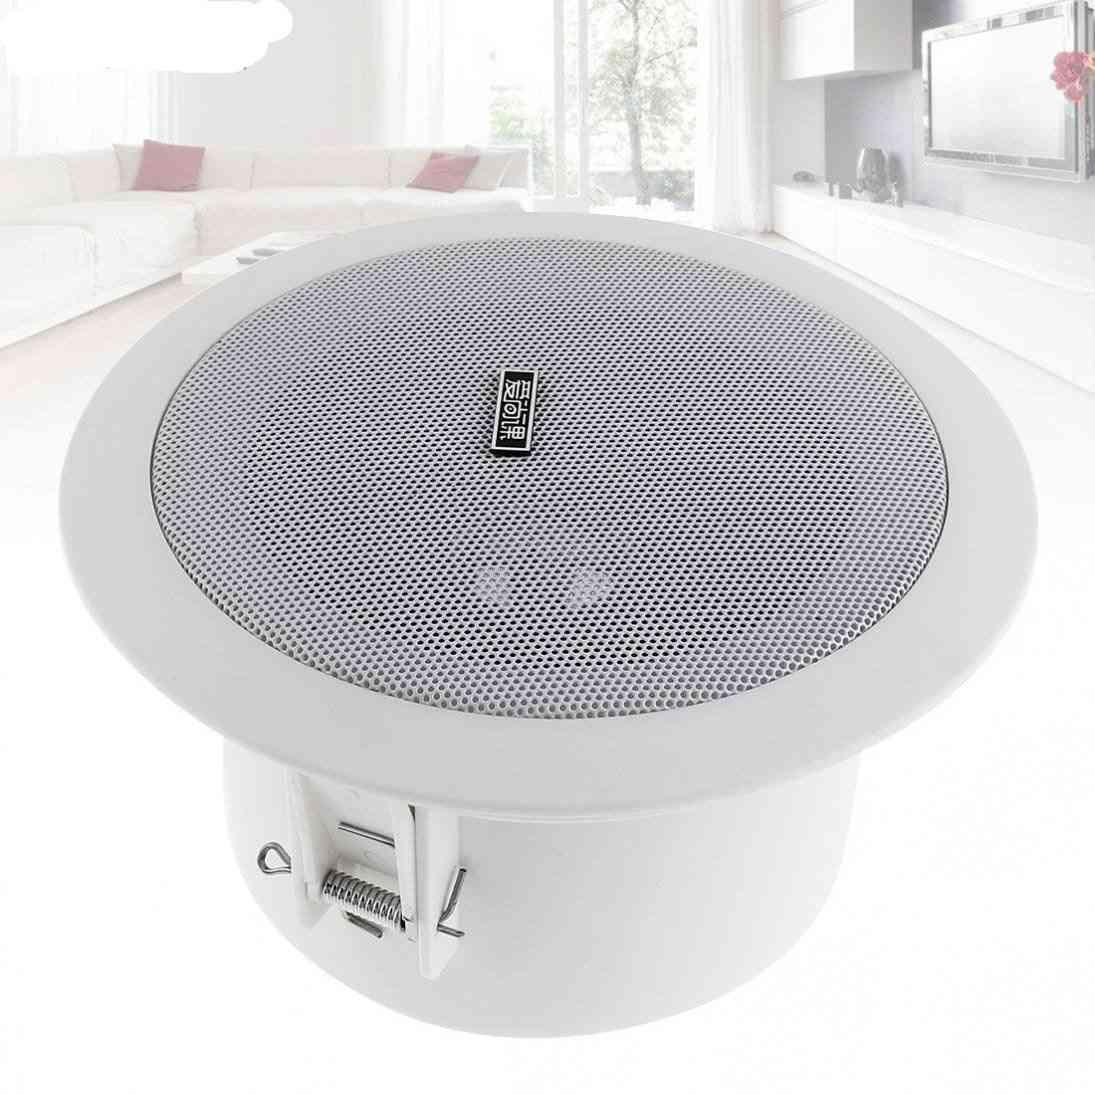 Waterproof Household Radio, Ceiling Portable Speaker, Public Broadcast Background Music Speaker